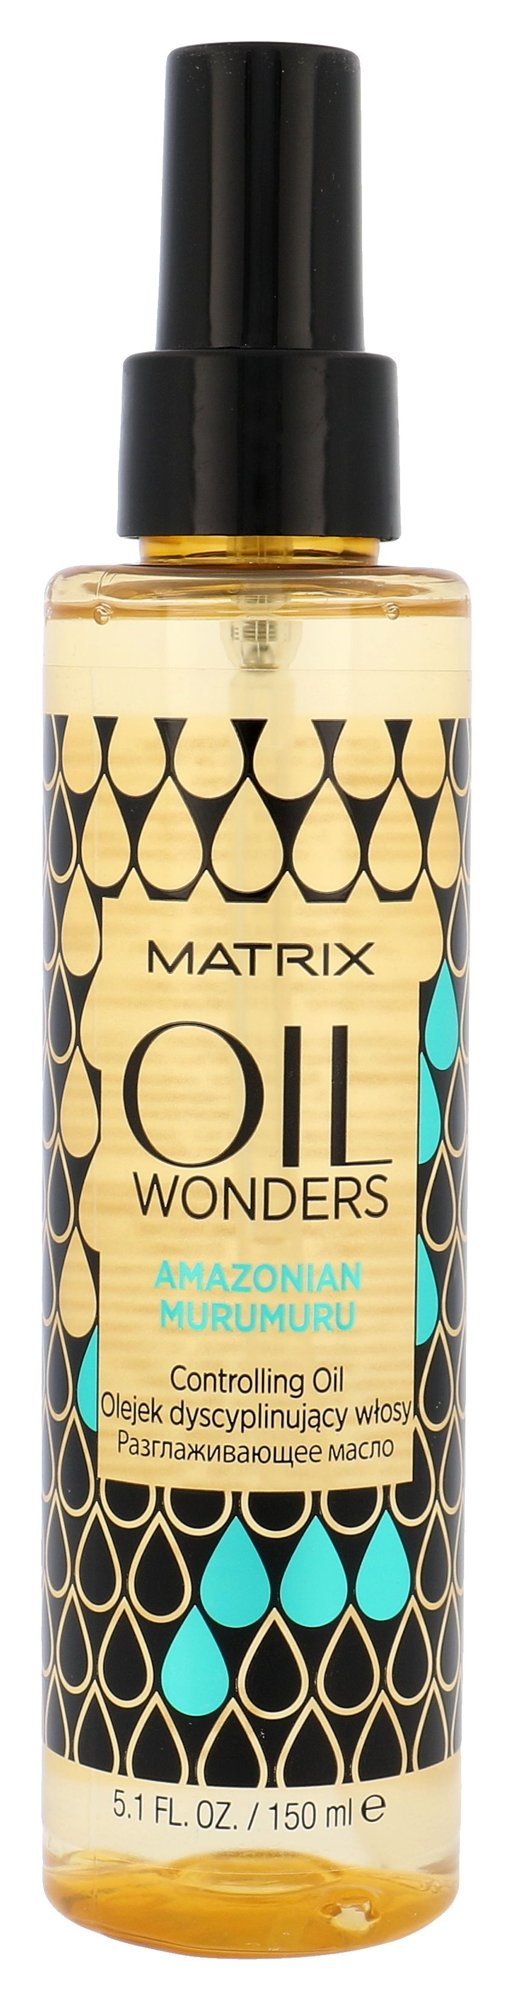 Matrix Oil Wonders Cosmetic 150ml